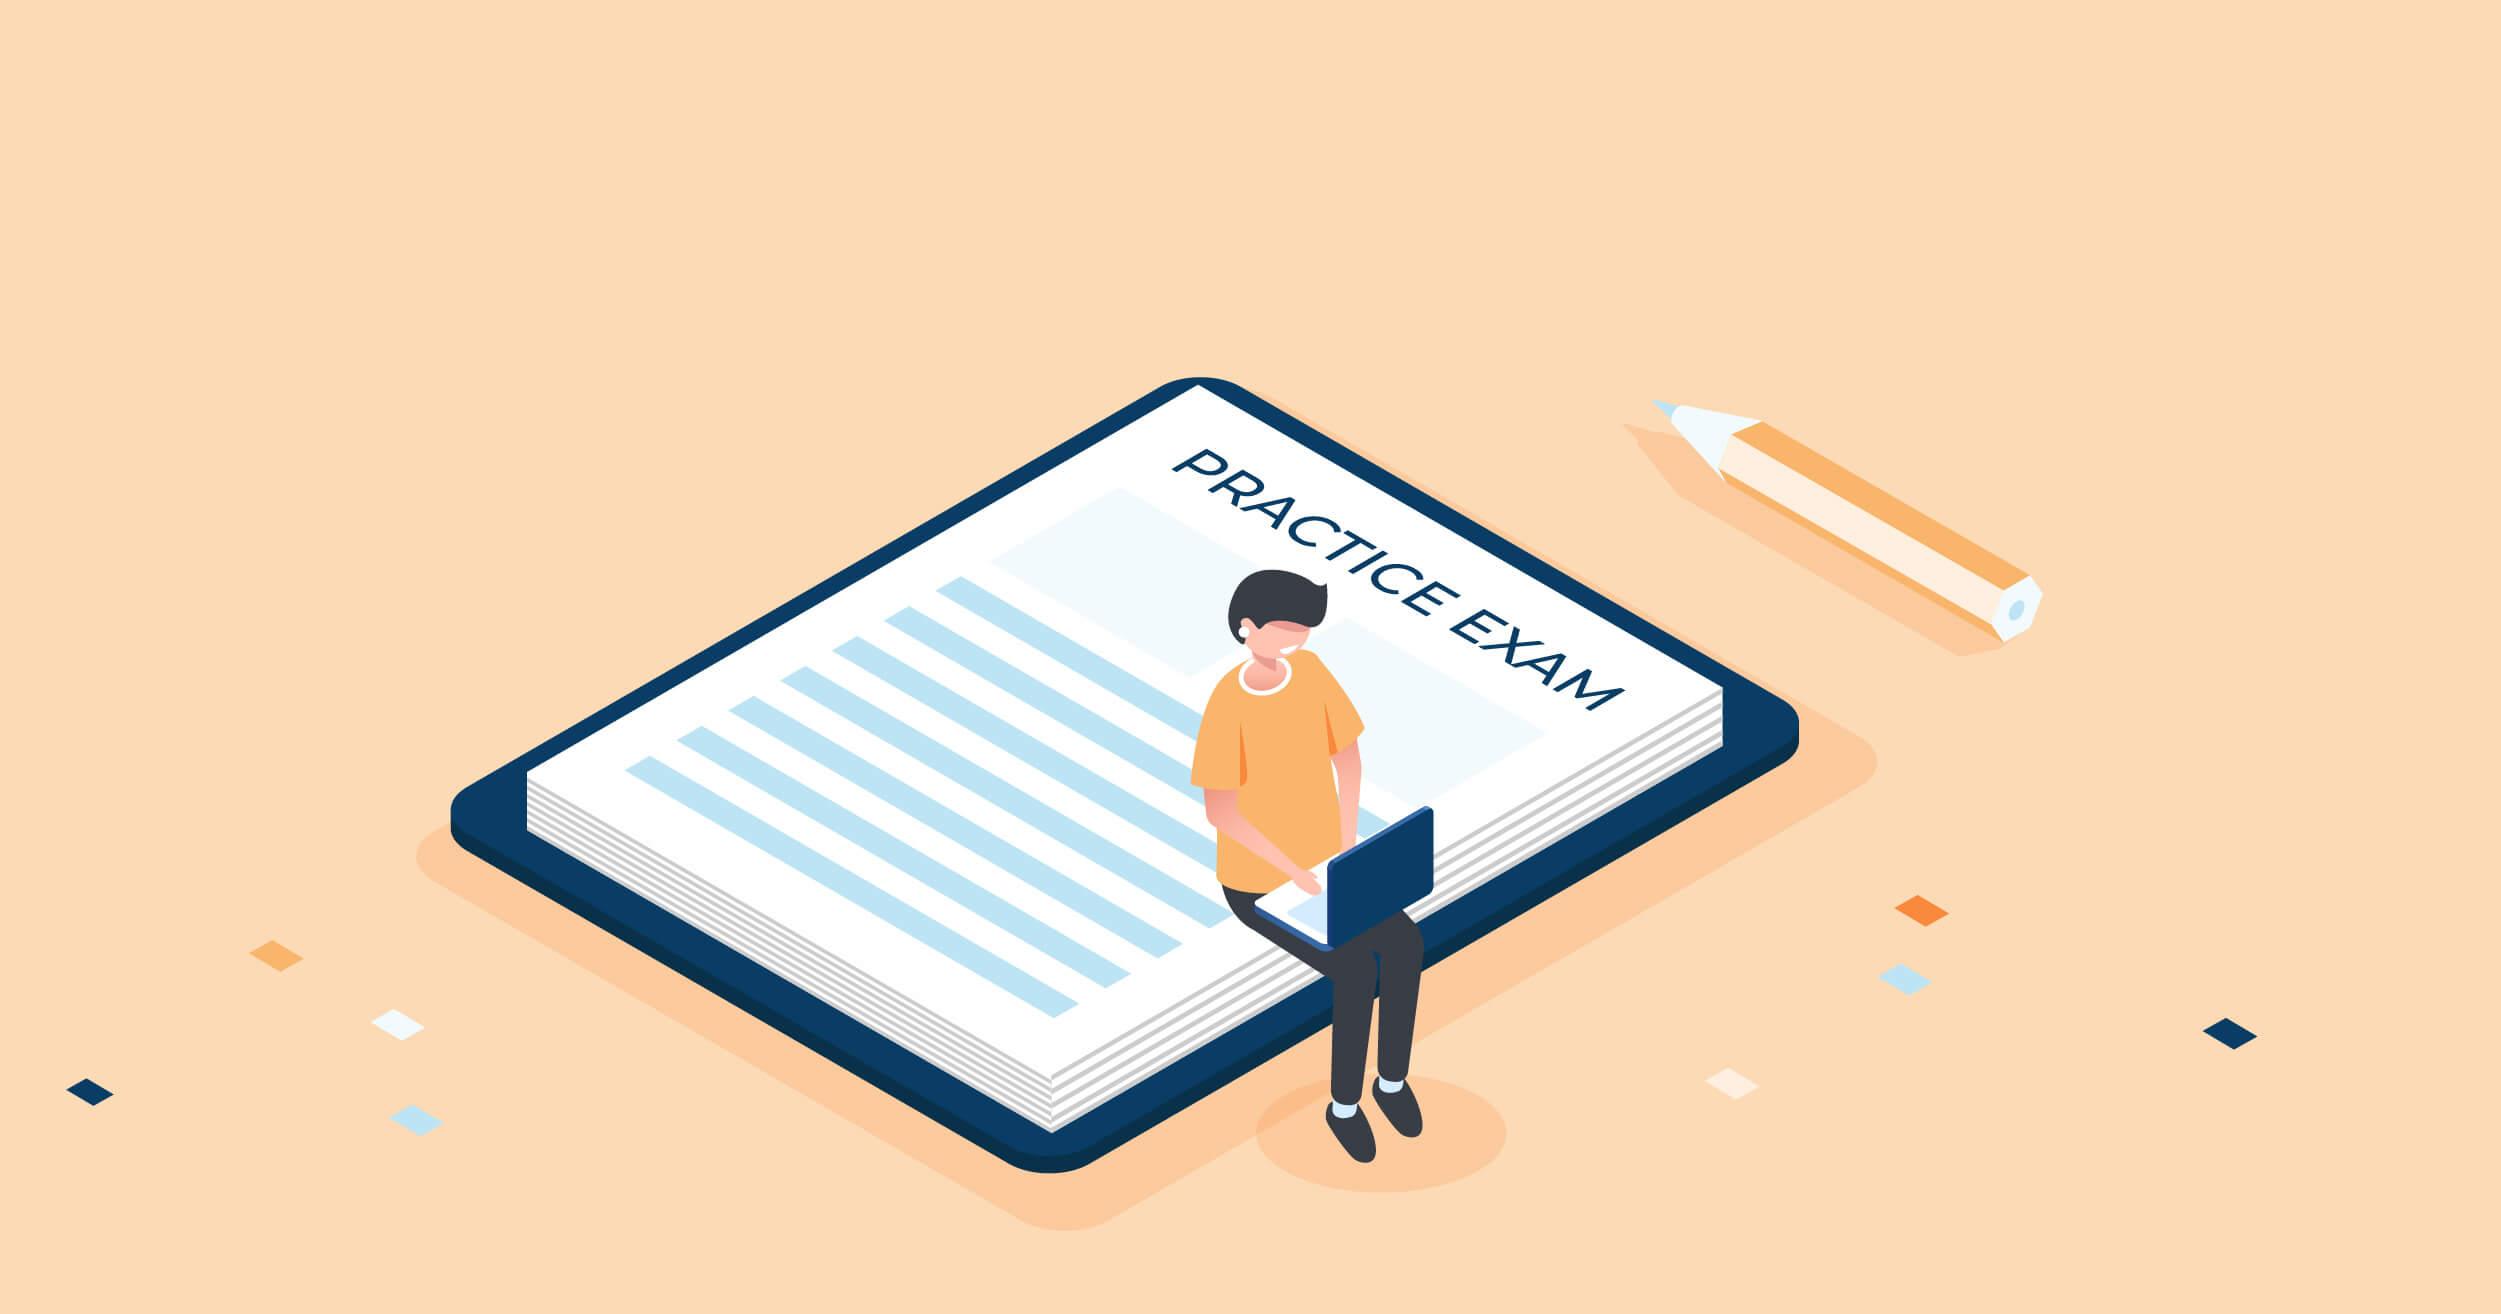 UCAT Practice Exam Image